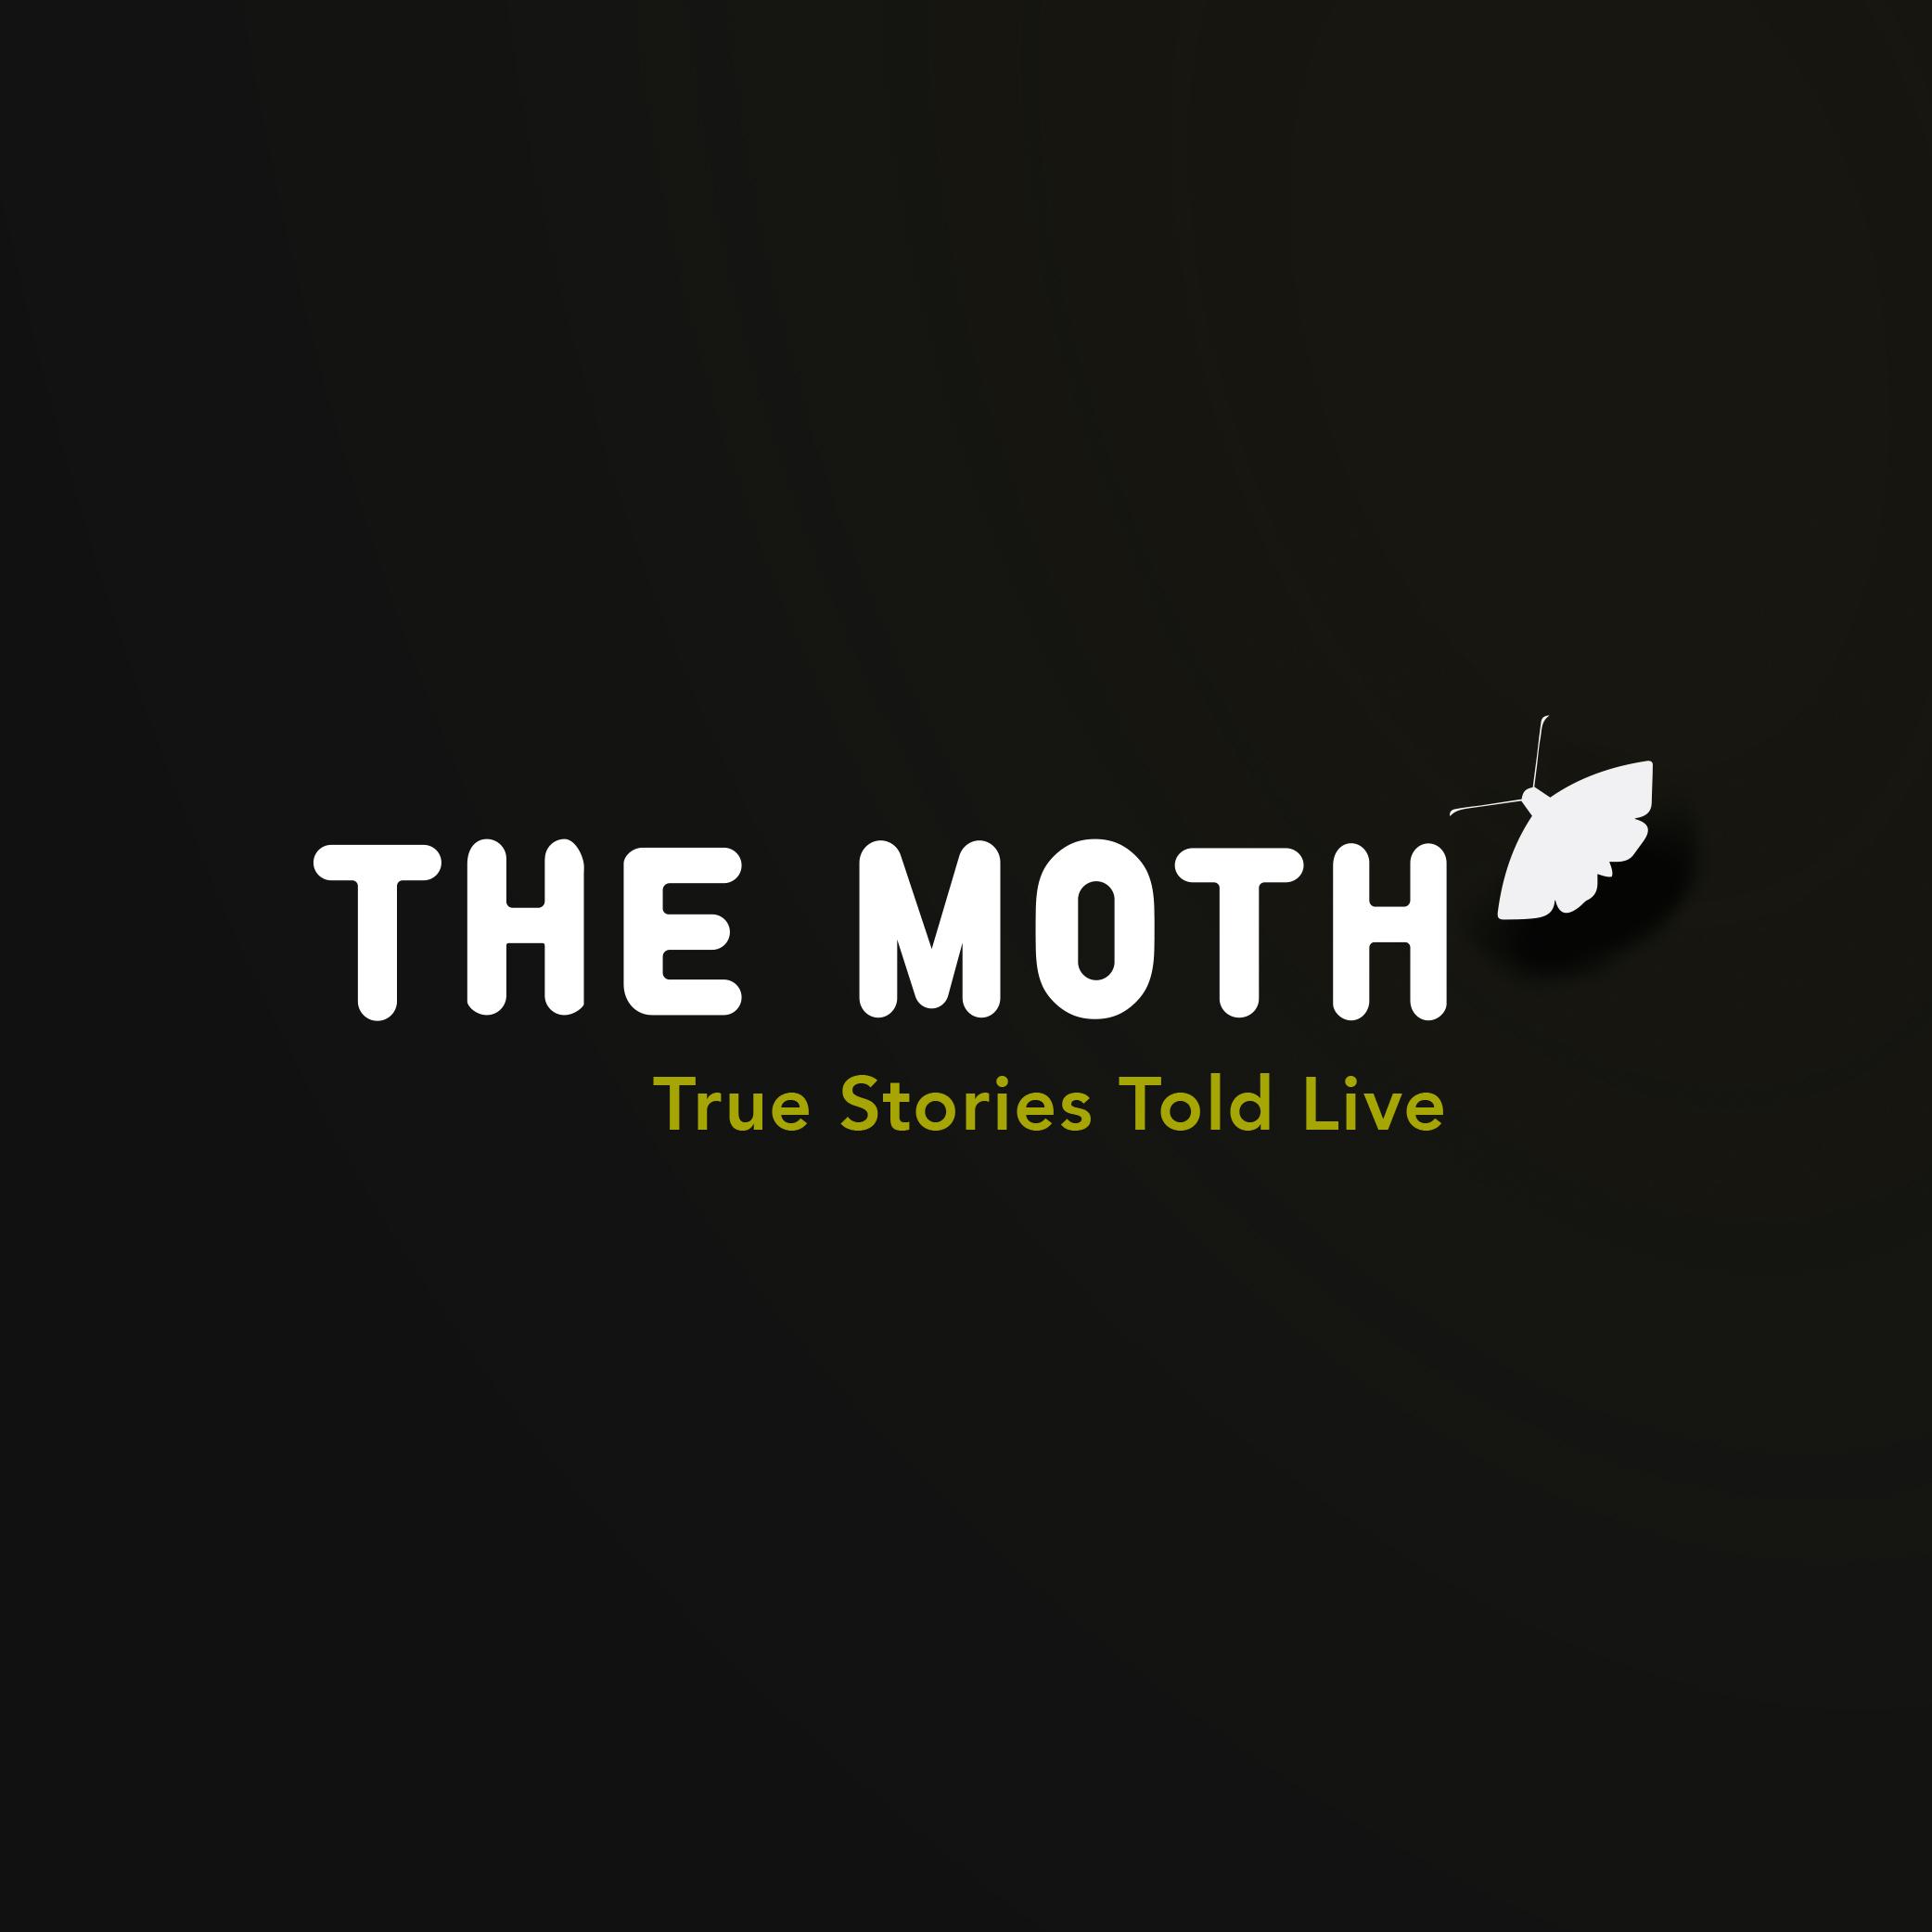 thumbnail_The-moth.jpg